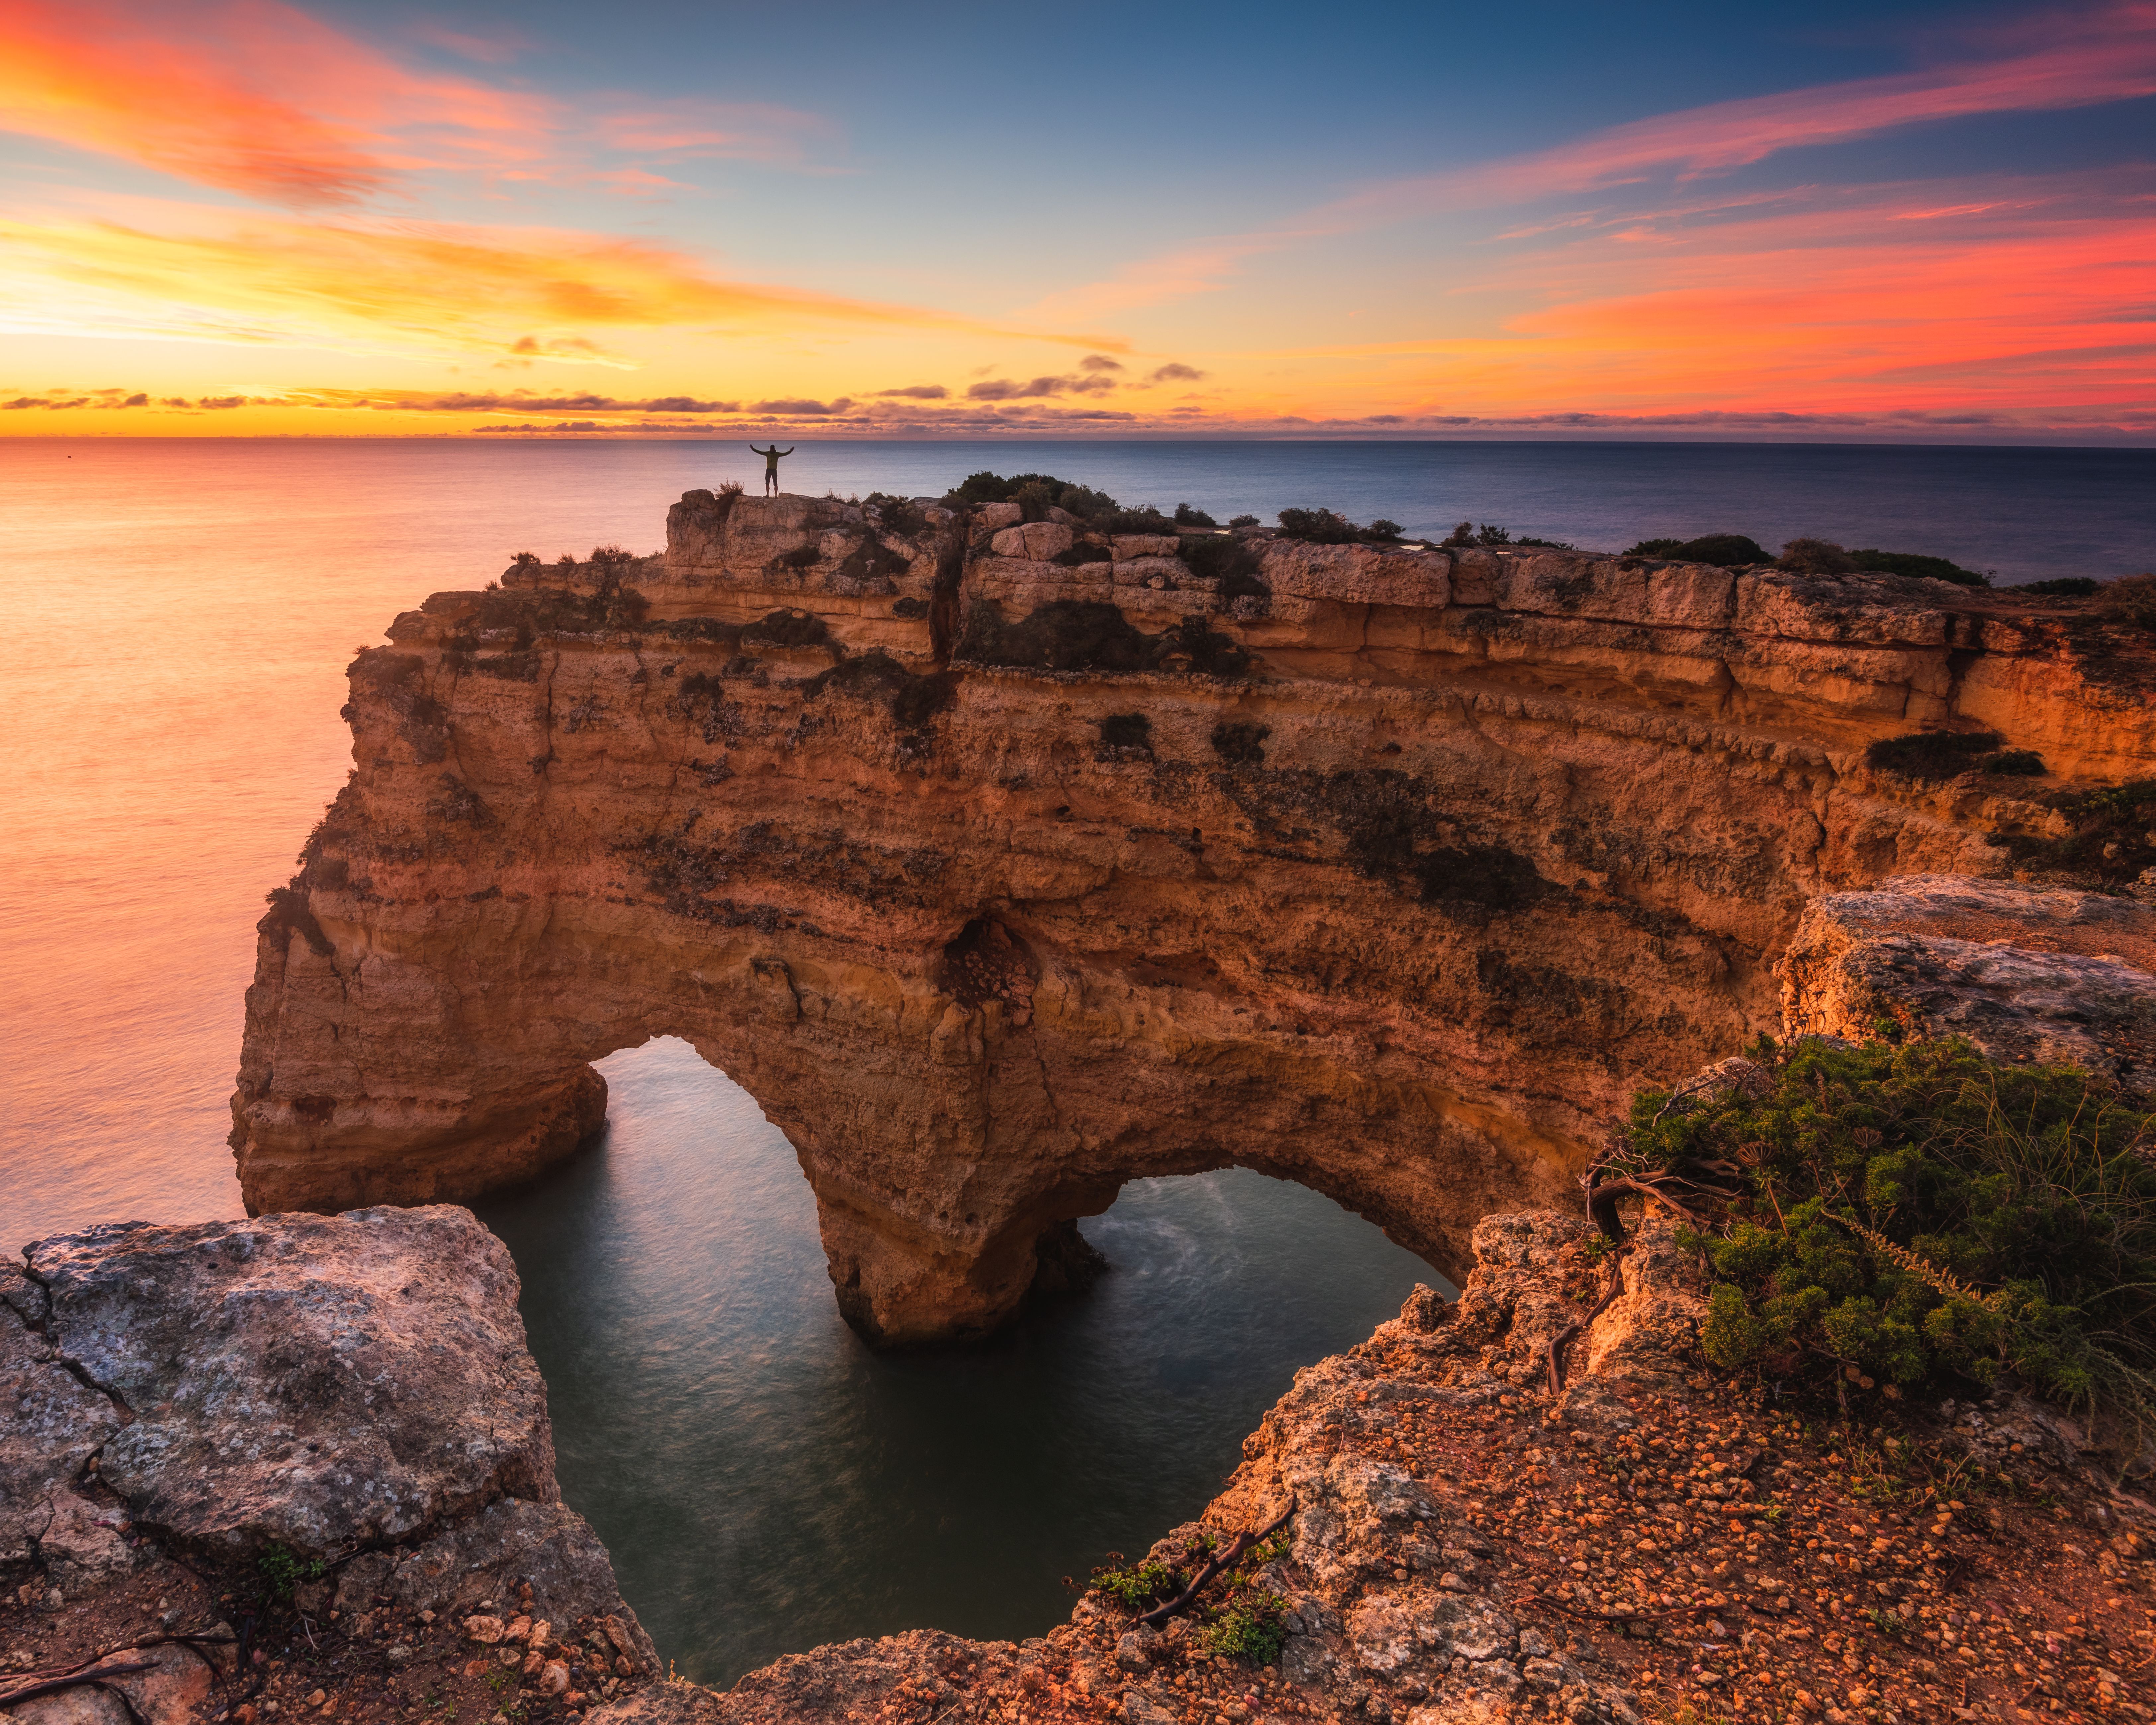 Praia da Marinha, Algarve, Portugal. Foto: Mikael Svensson, www.mikaelsvensson.com